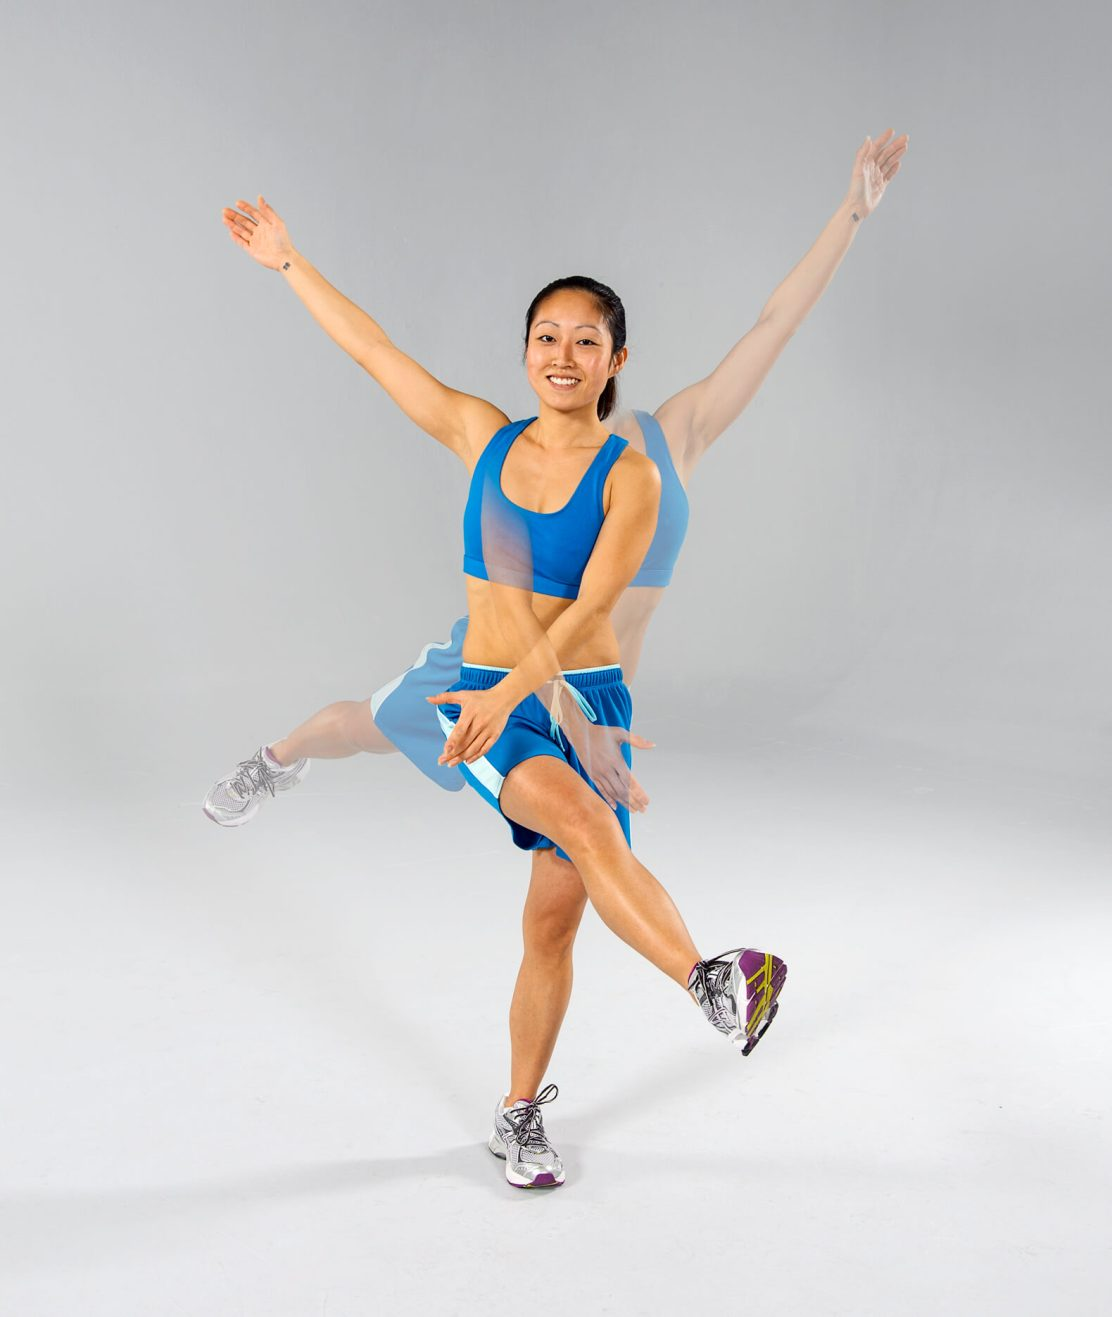 static stretching vs. dynamic stretching: dynamic stretch